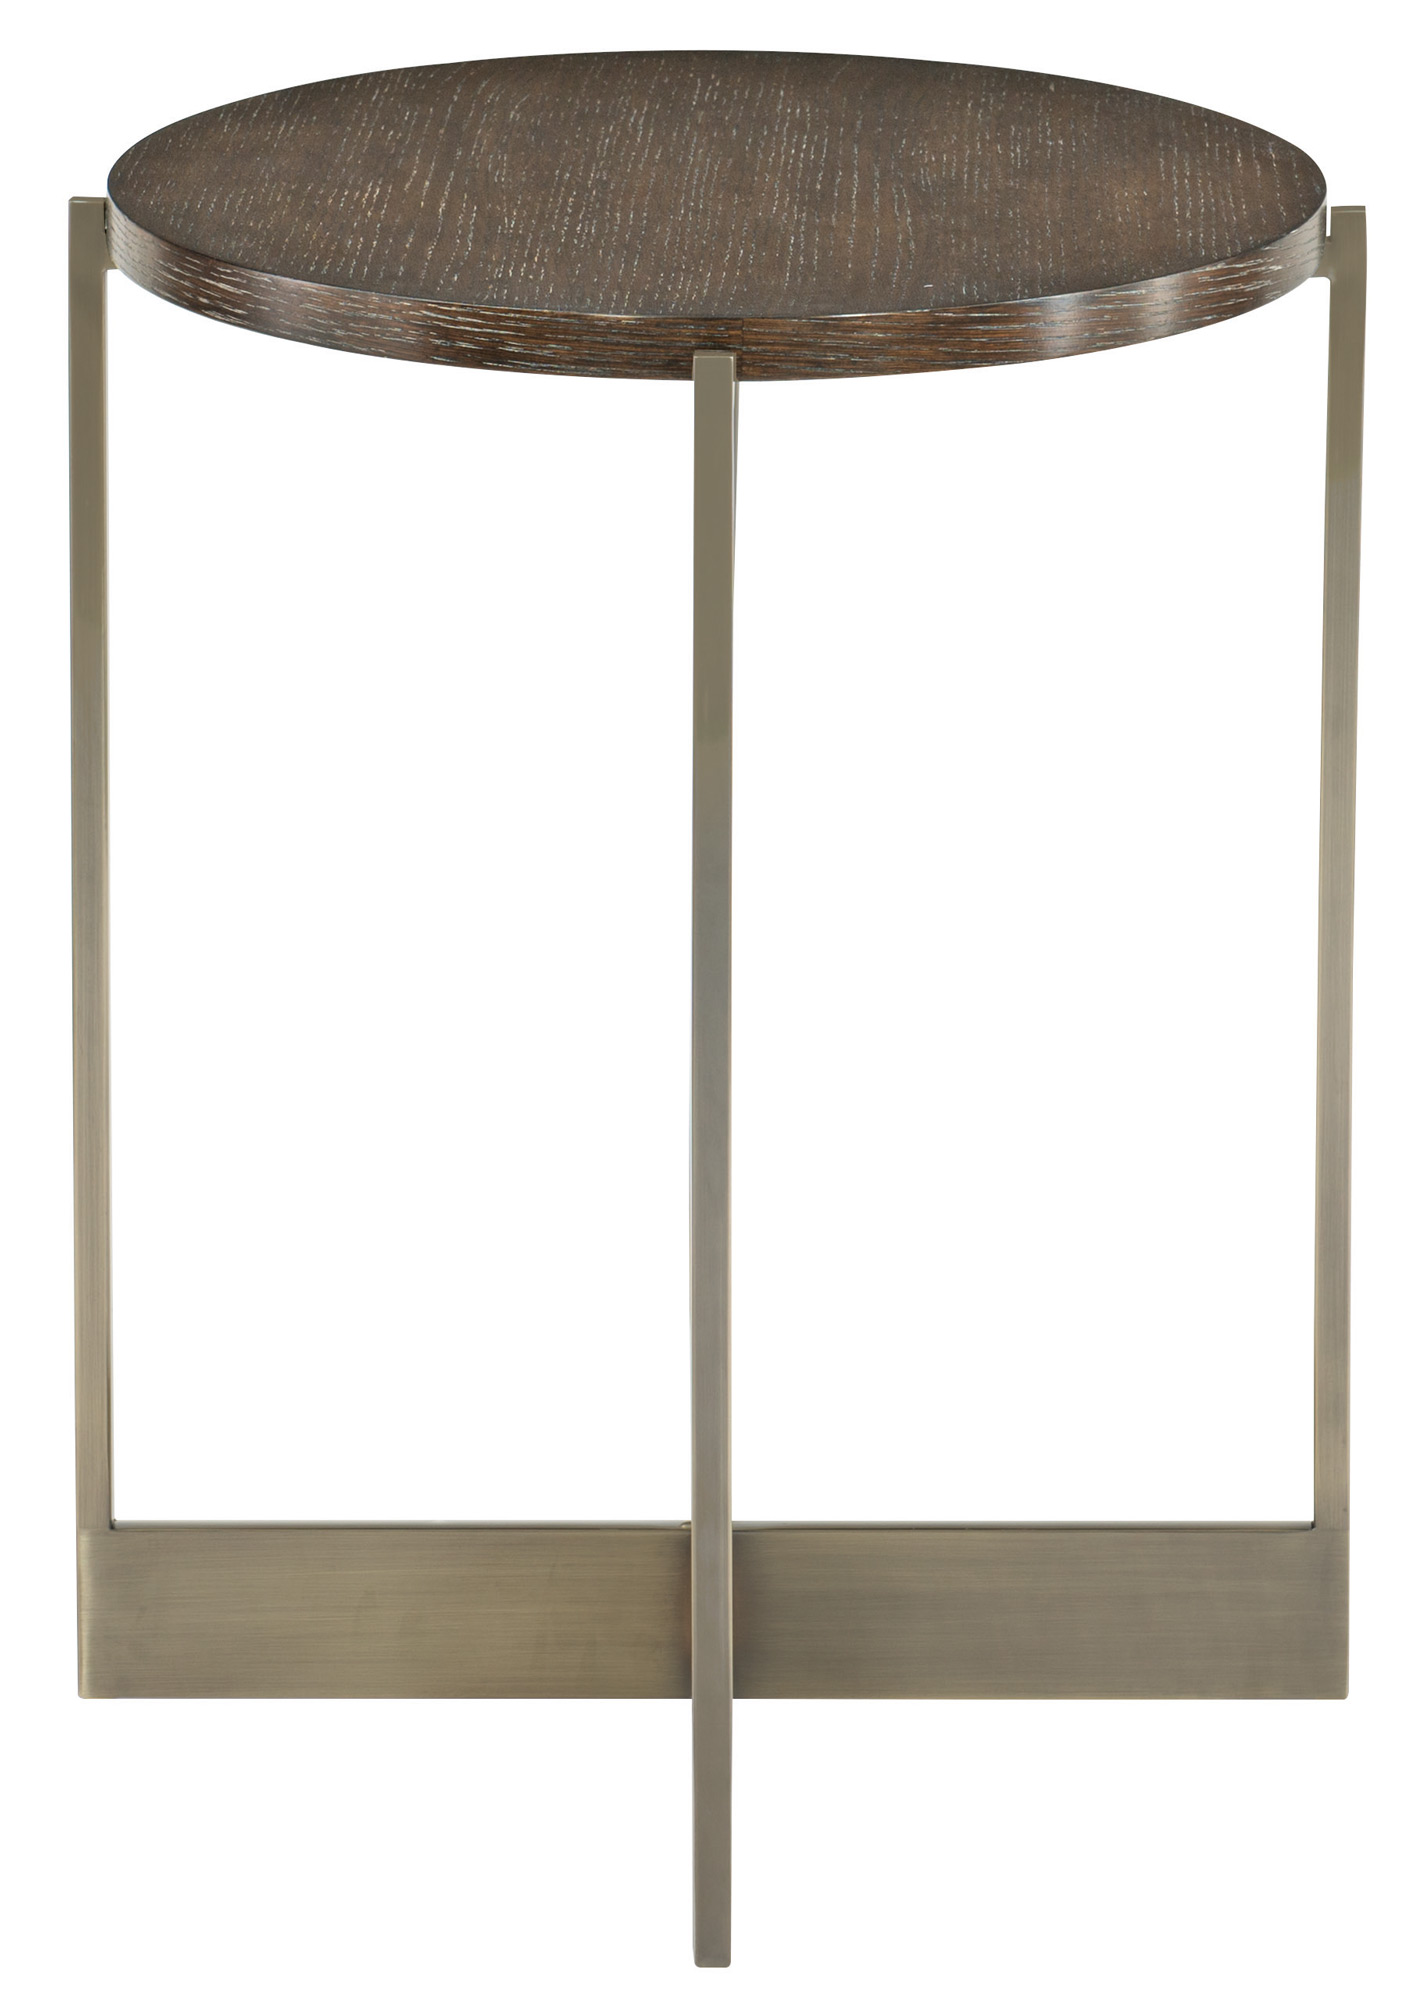 Oval End Table Bernhardt Hospitality